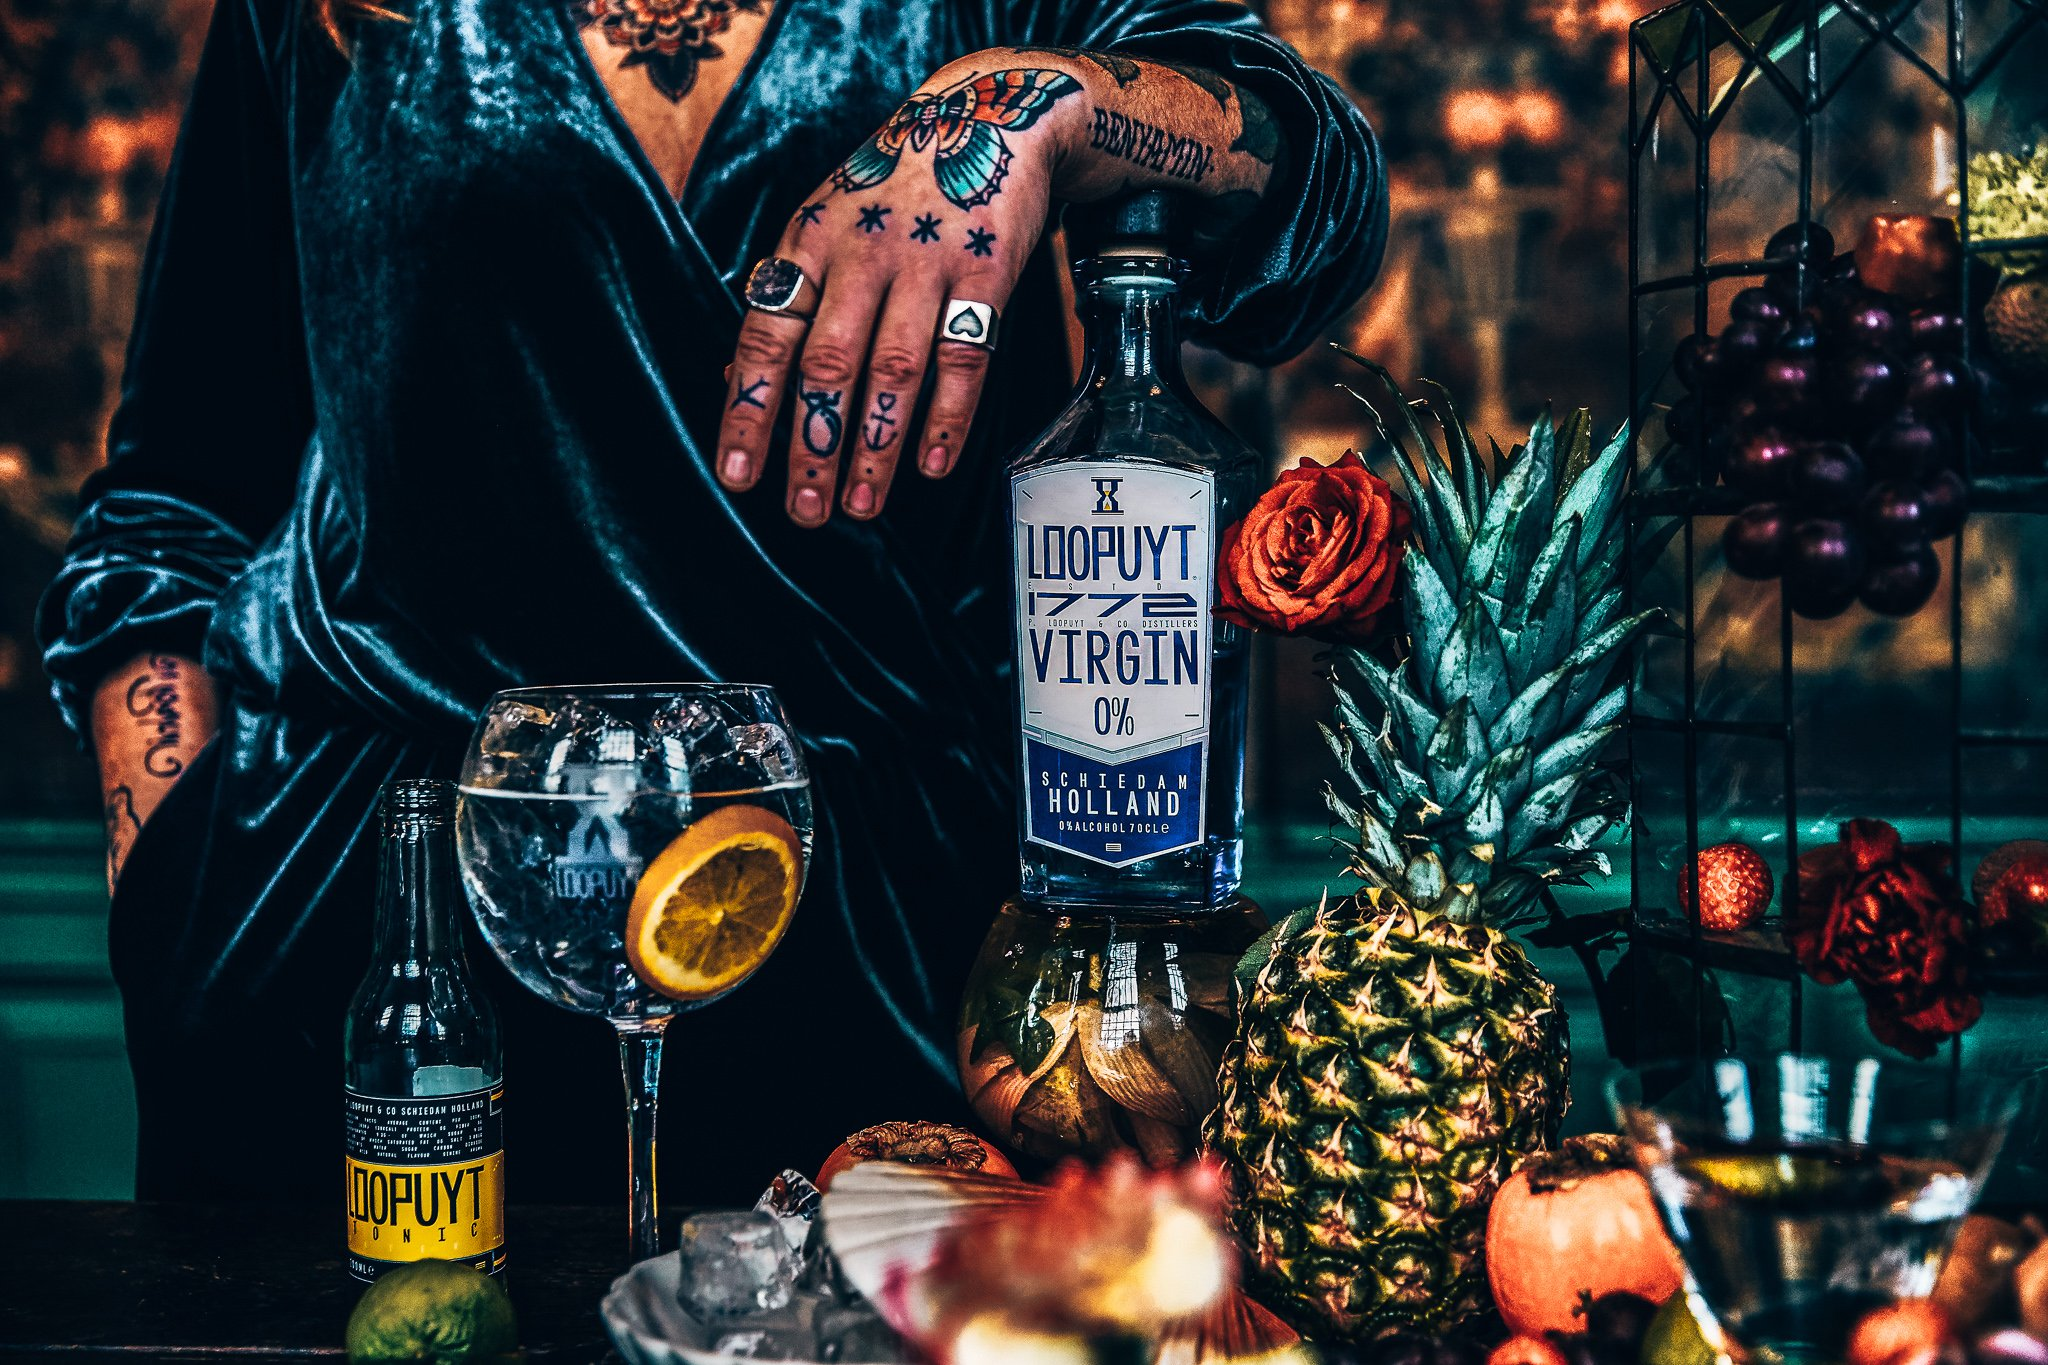 Perfect serve met Loopuyt Virgin 0%, Alles over gin.